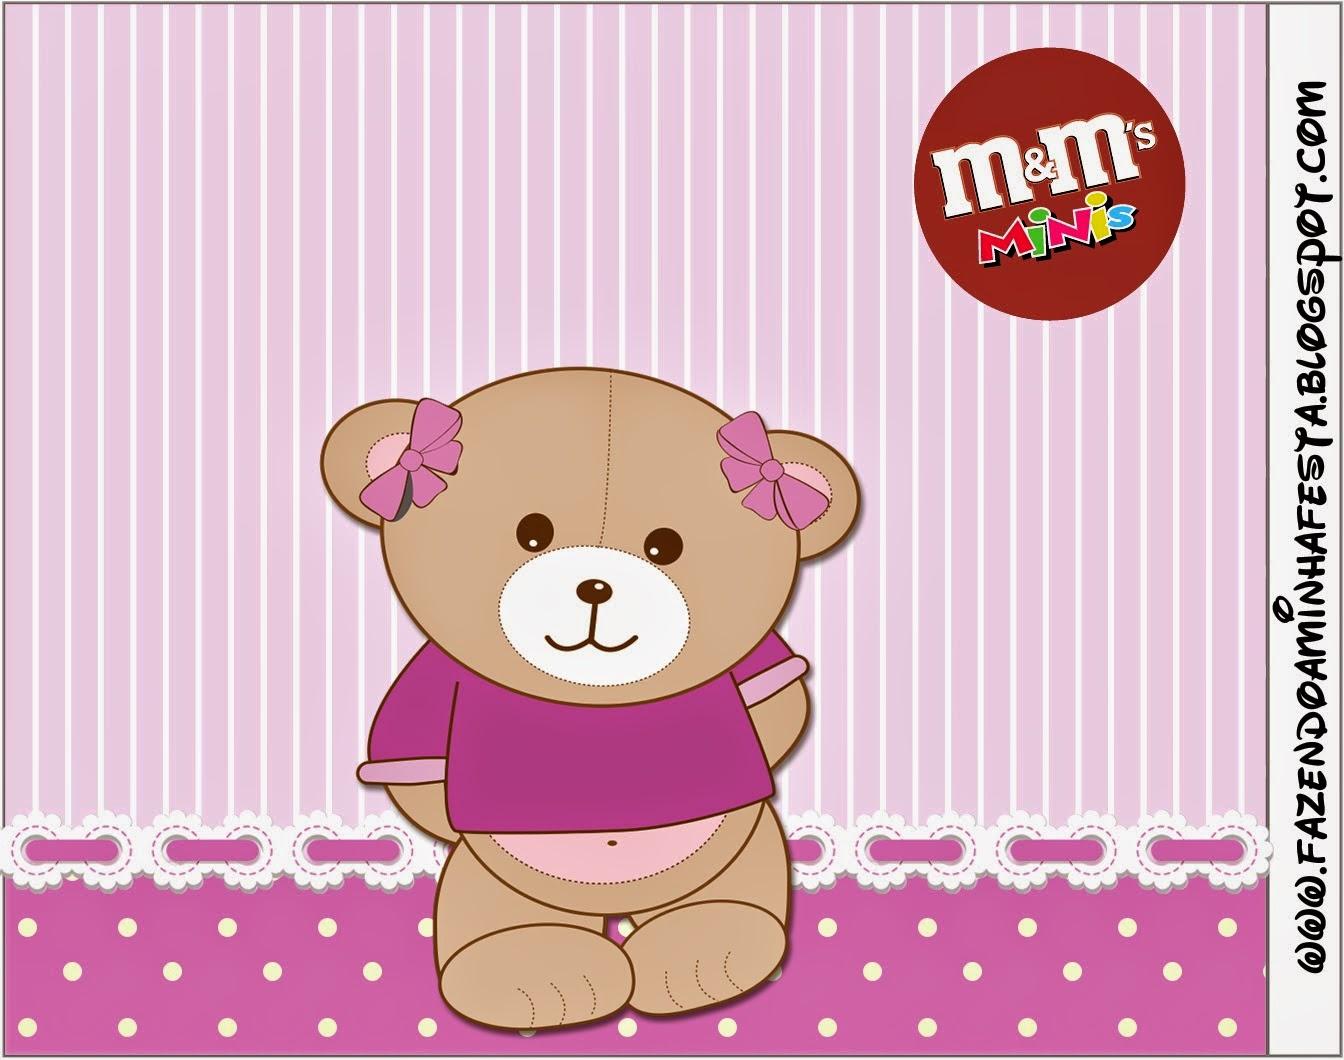 Etiqueta M&M de Osita en Fondo Lila para imprimir gratis.